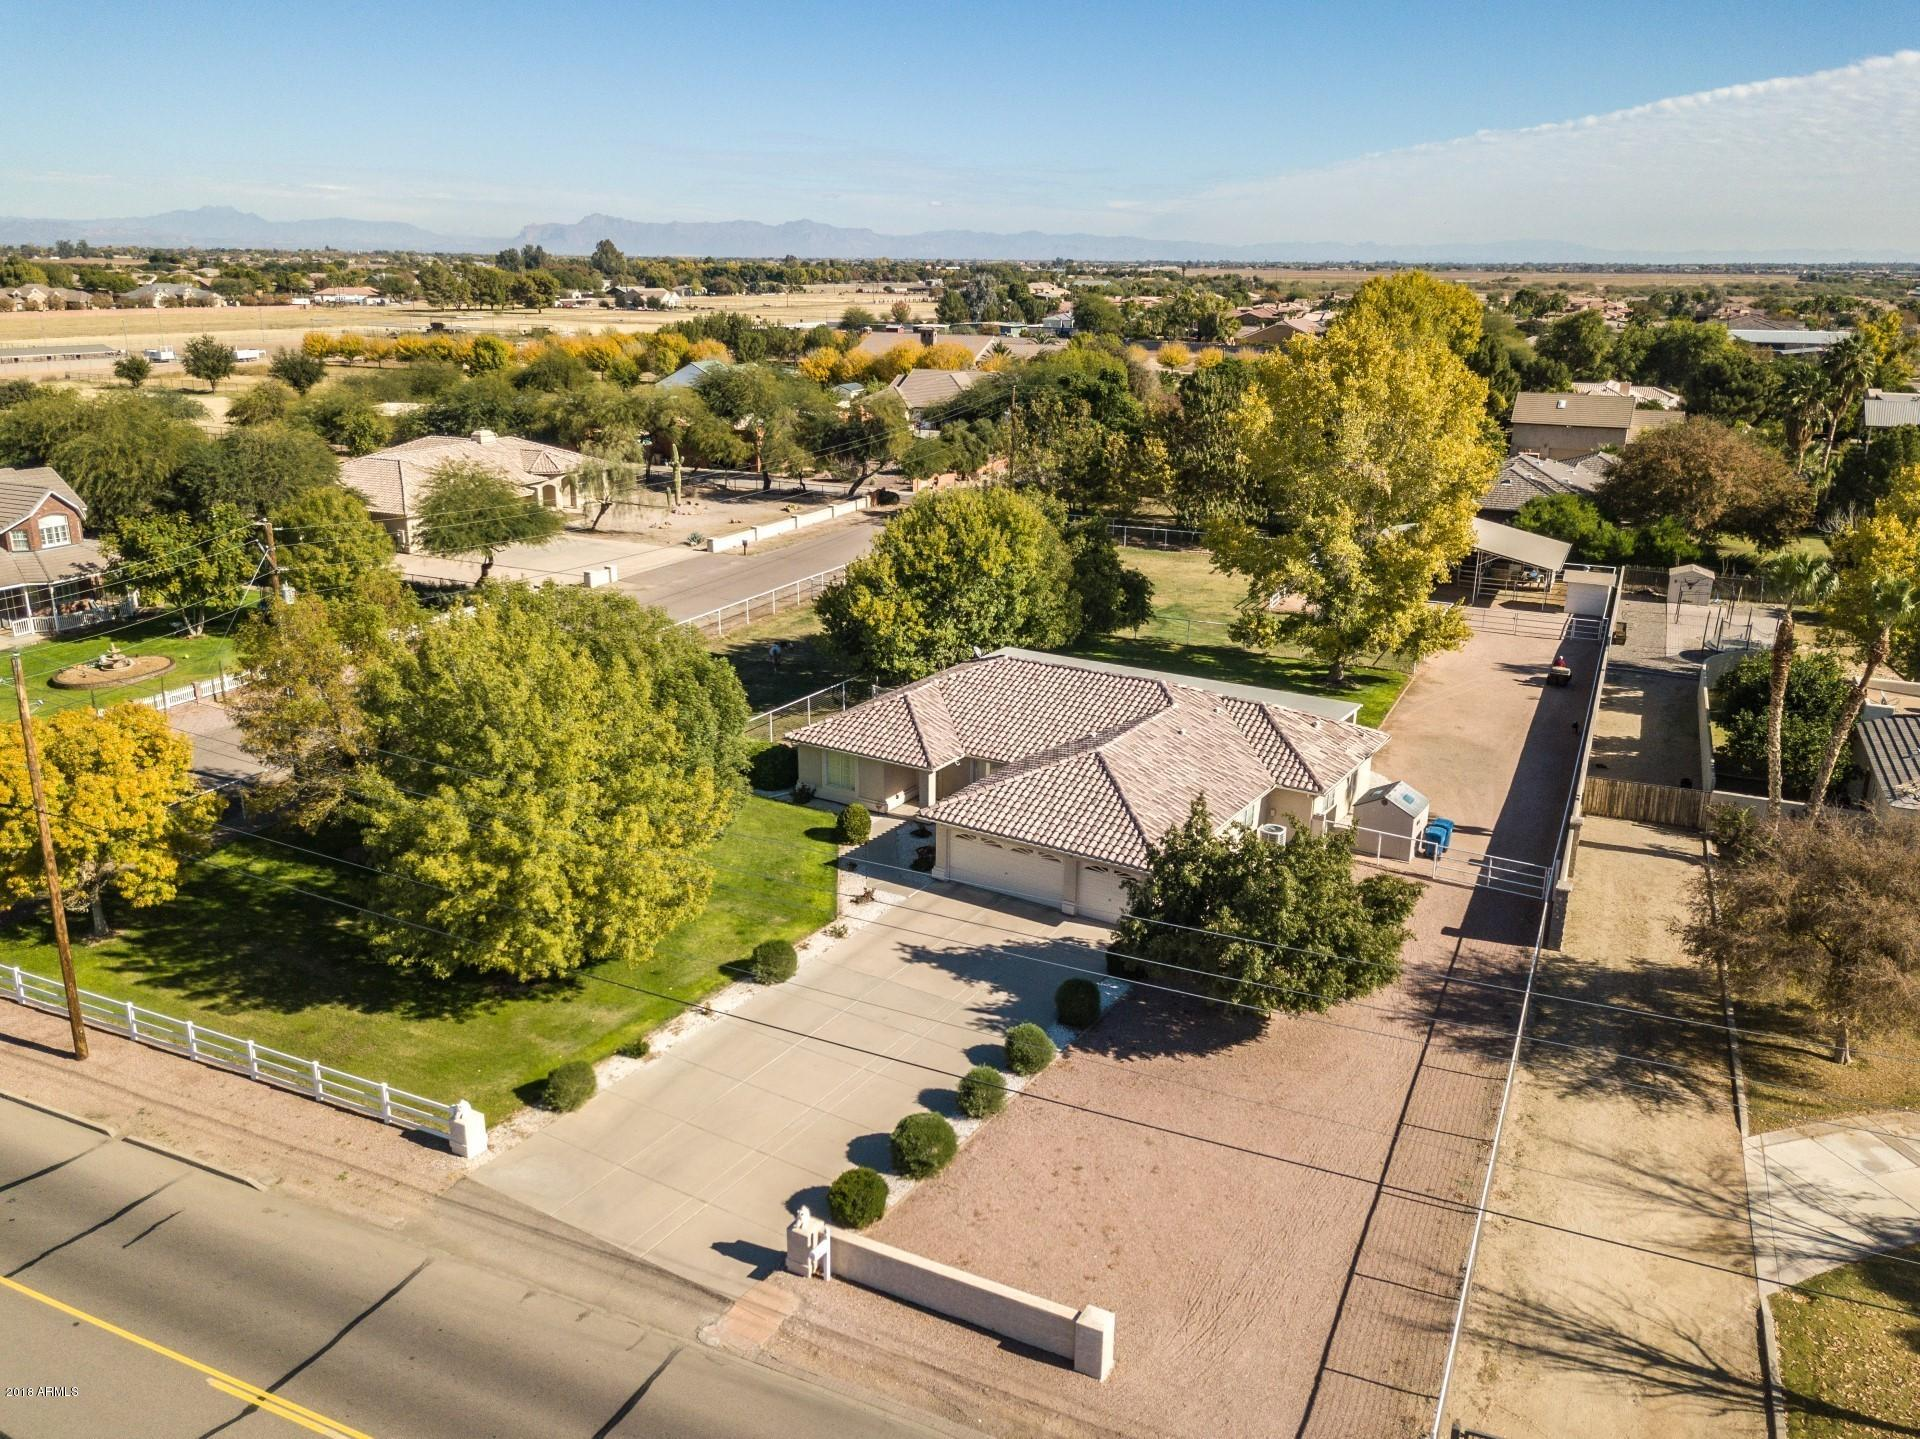 Photo of 24725 S LINDSAY Road, Chandler, AZ 85249